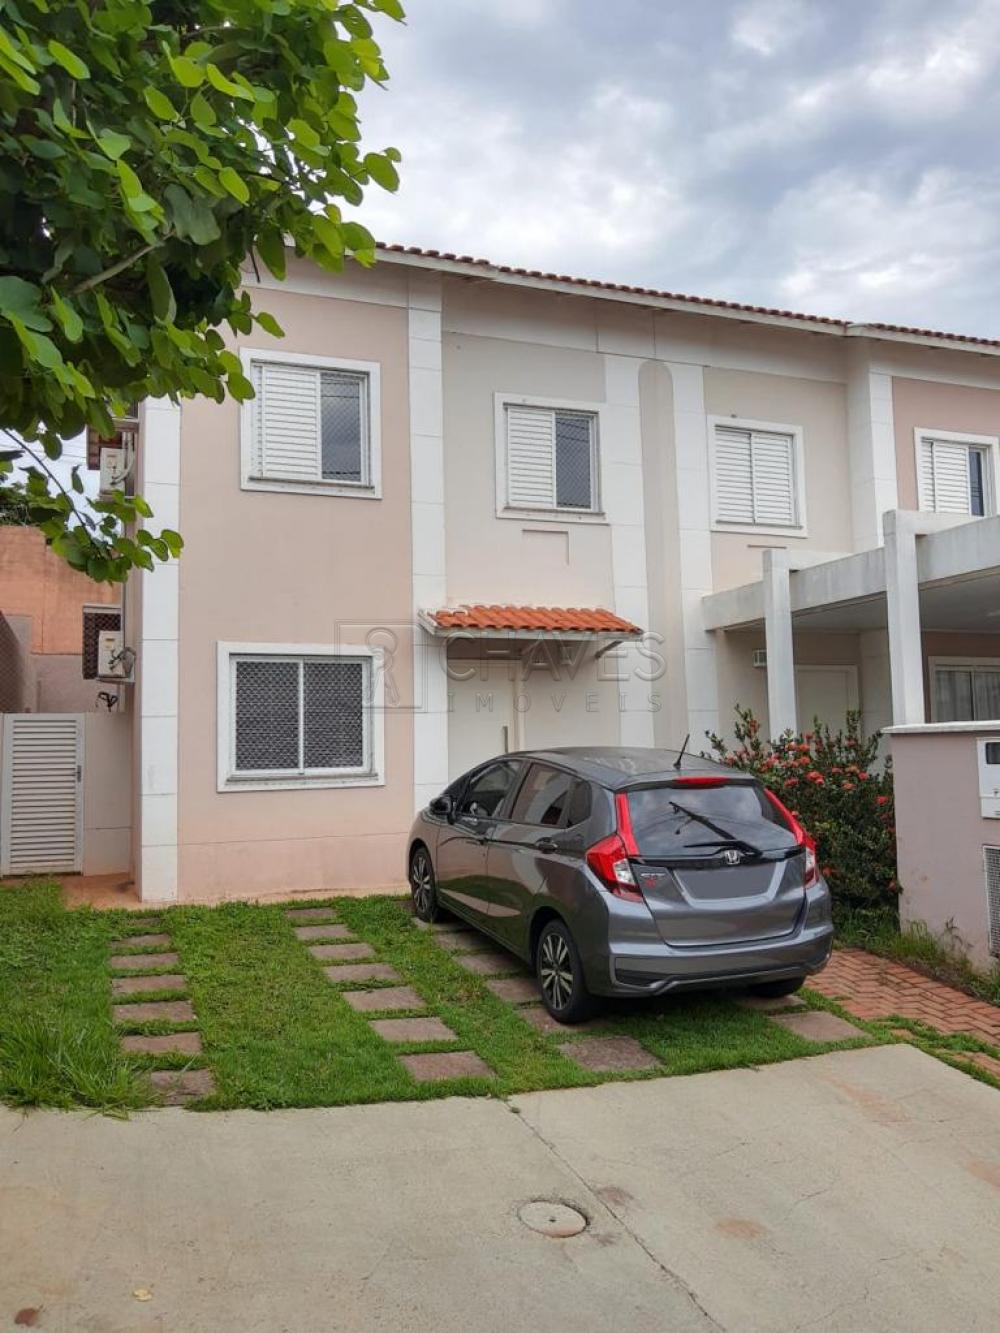 Ribeirao Preto Casa Venda R$440.000,00 Condominio R$400,00 3 Dormitorios 1 Suite Area do terreno 146.56m2 Area construida 99.57m2